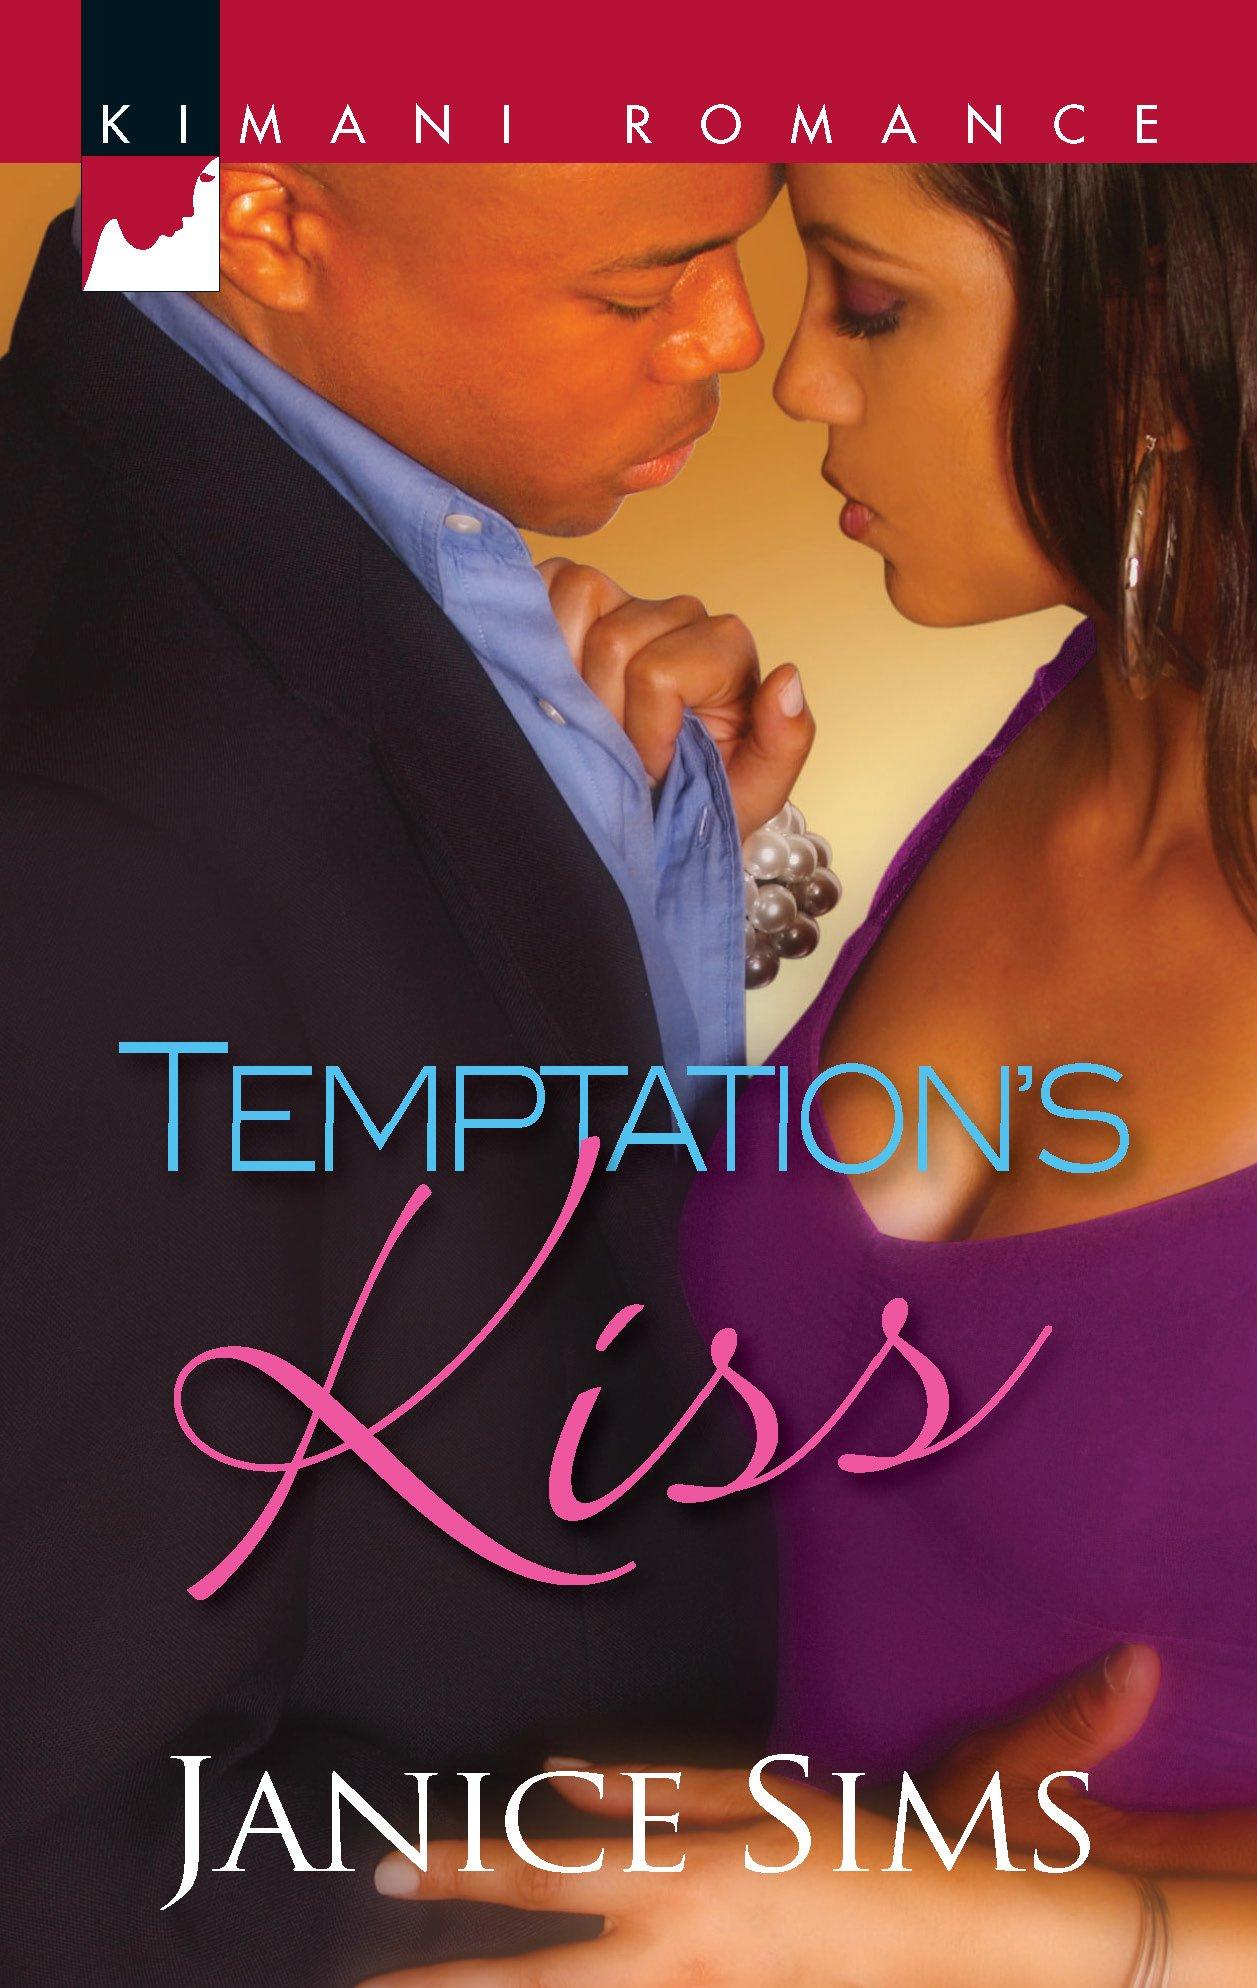 Amazon.com: Temptation's Kiss (Kimani Romance) (9780373862108): Janice  Sims: Books